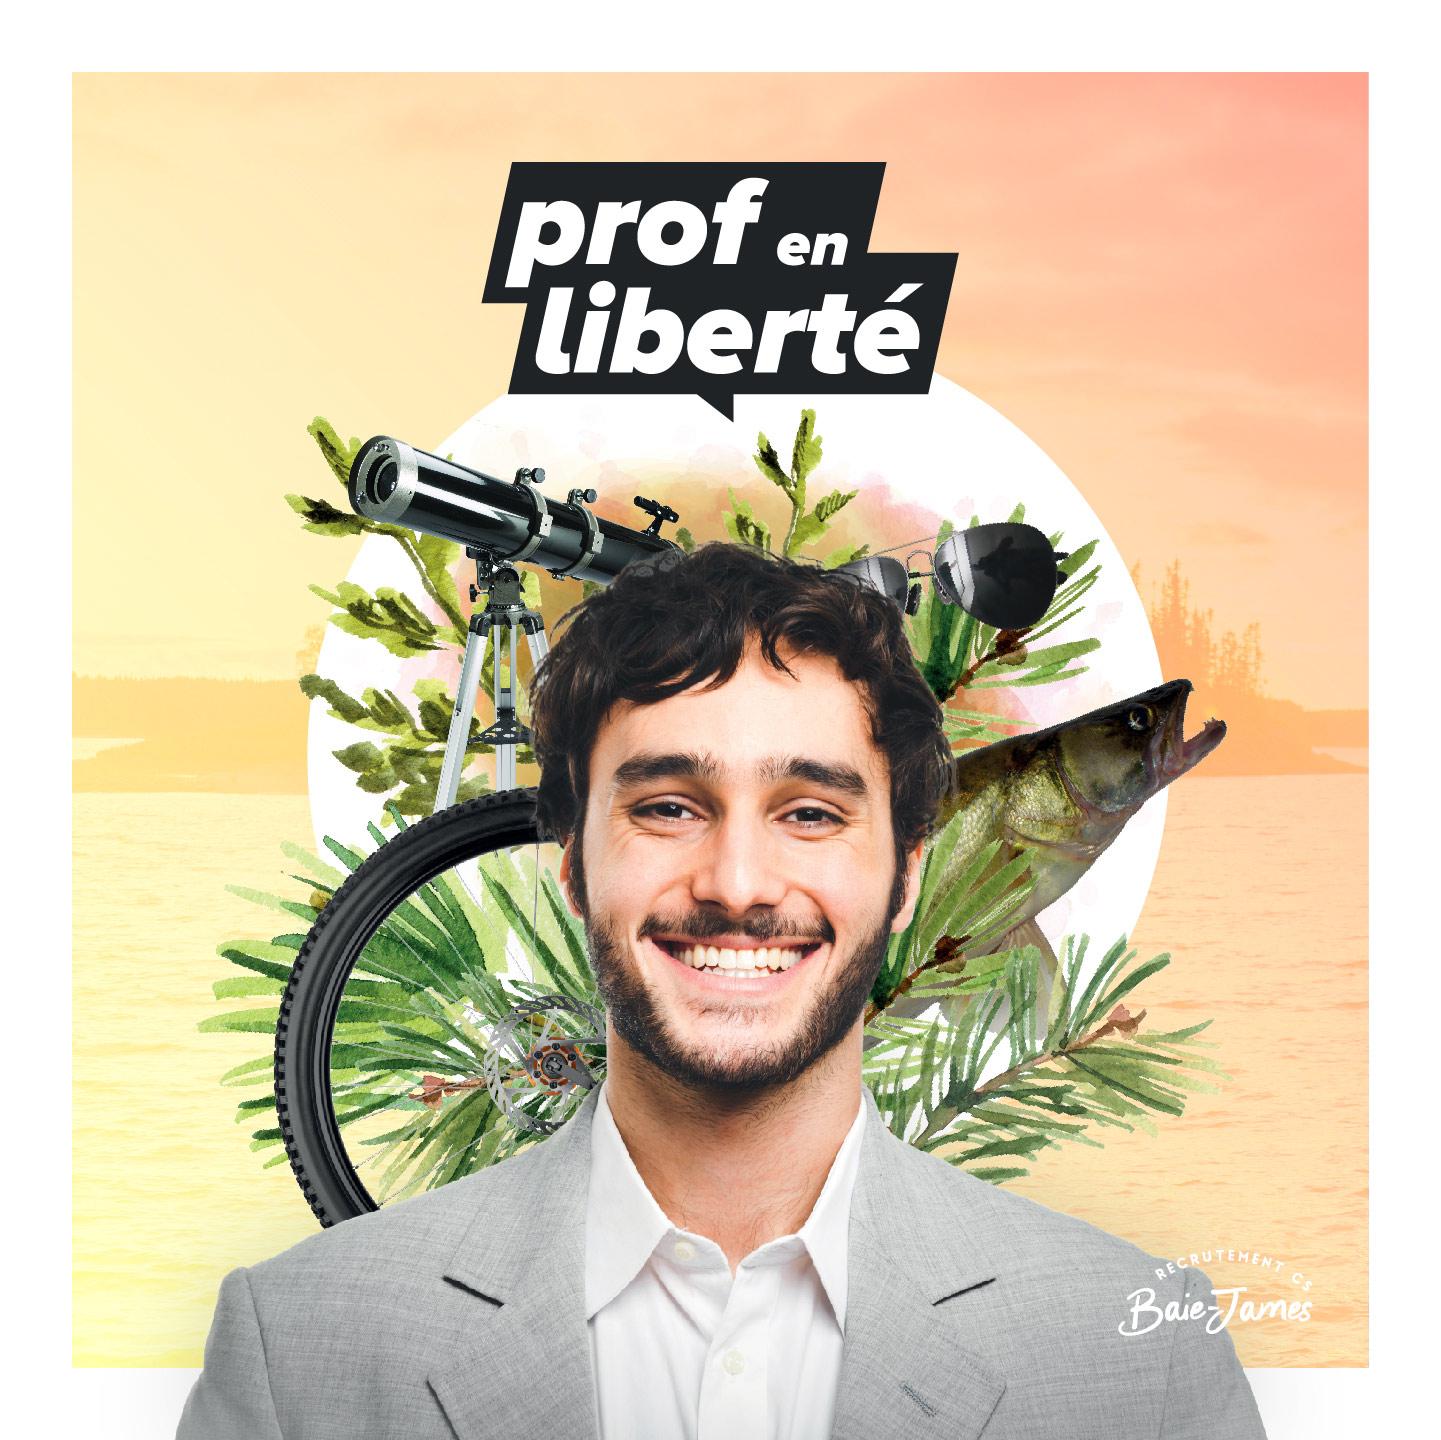 csbj-prof-en-liberte-01